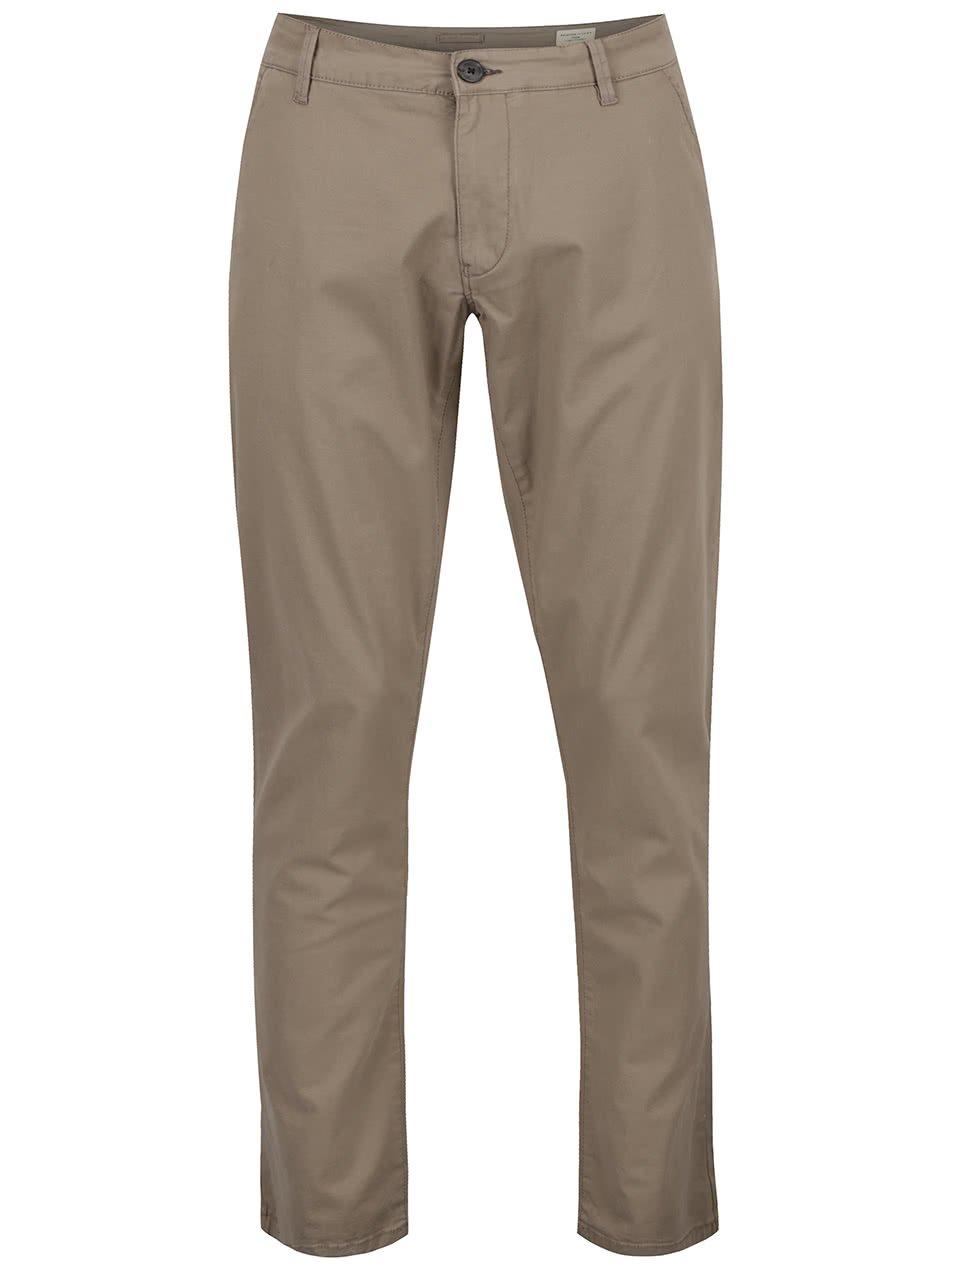 Béžové chino kalhoty Selected Homme Three Paris